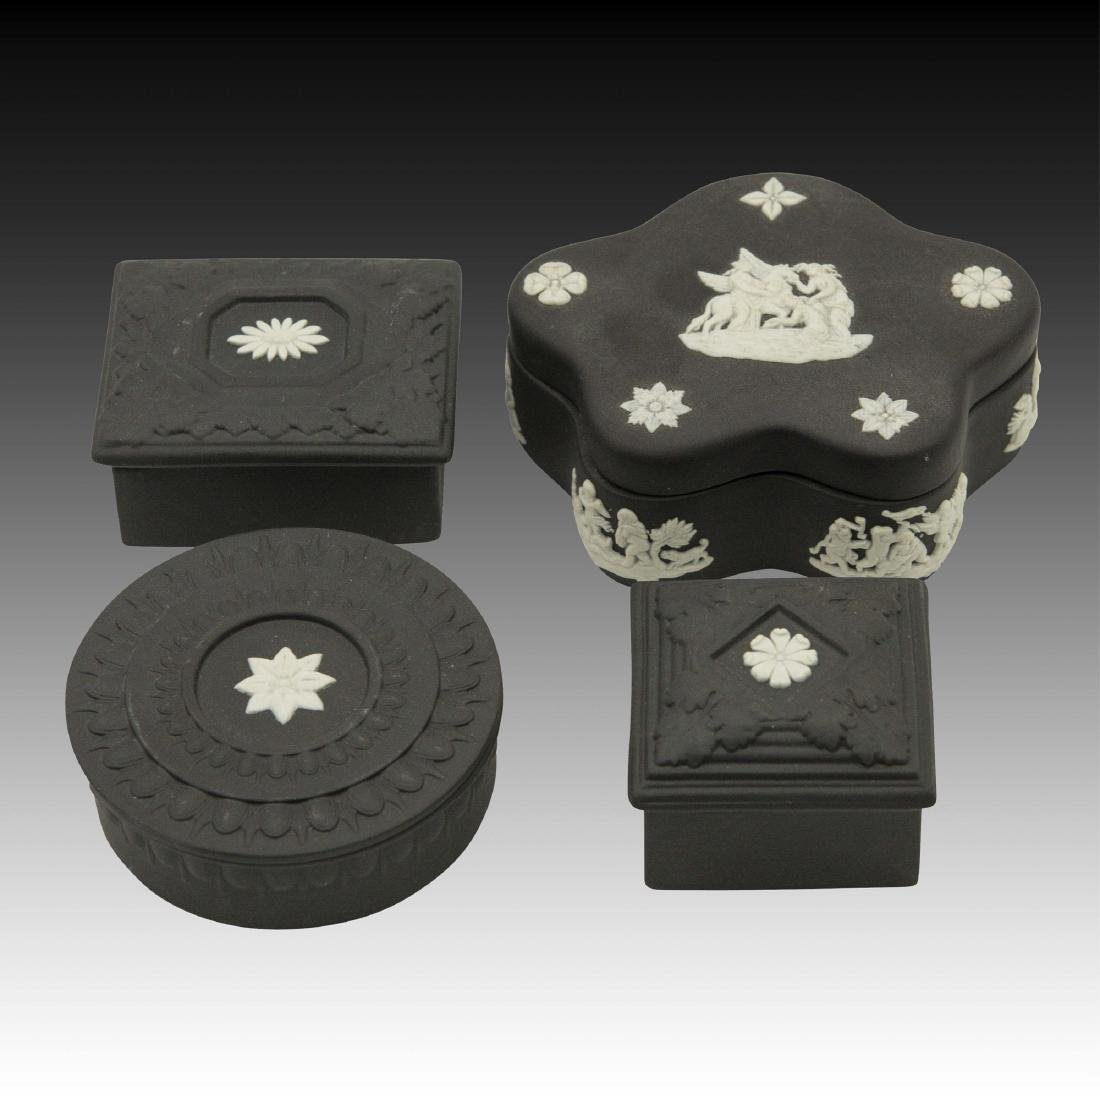 4 Wedgwood Jasperware Basalt boxes